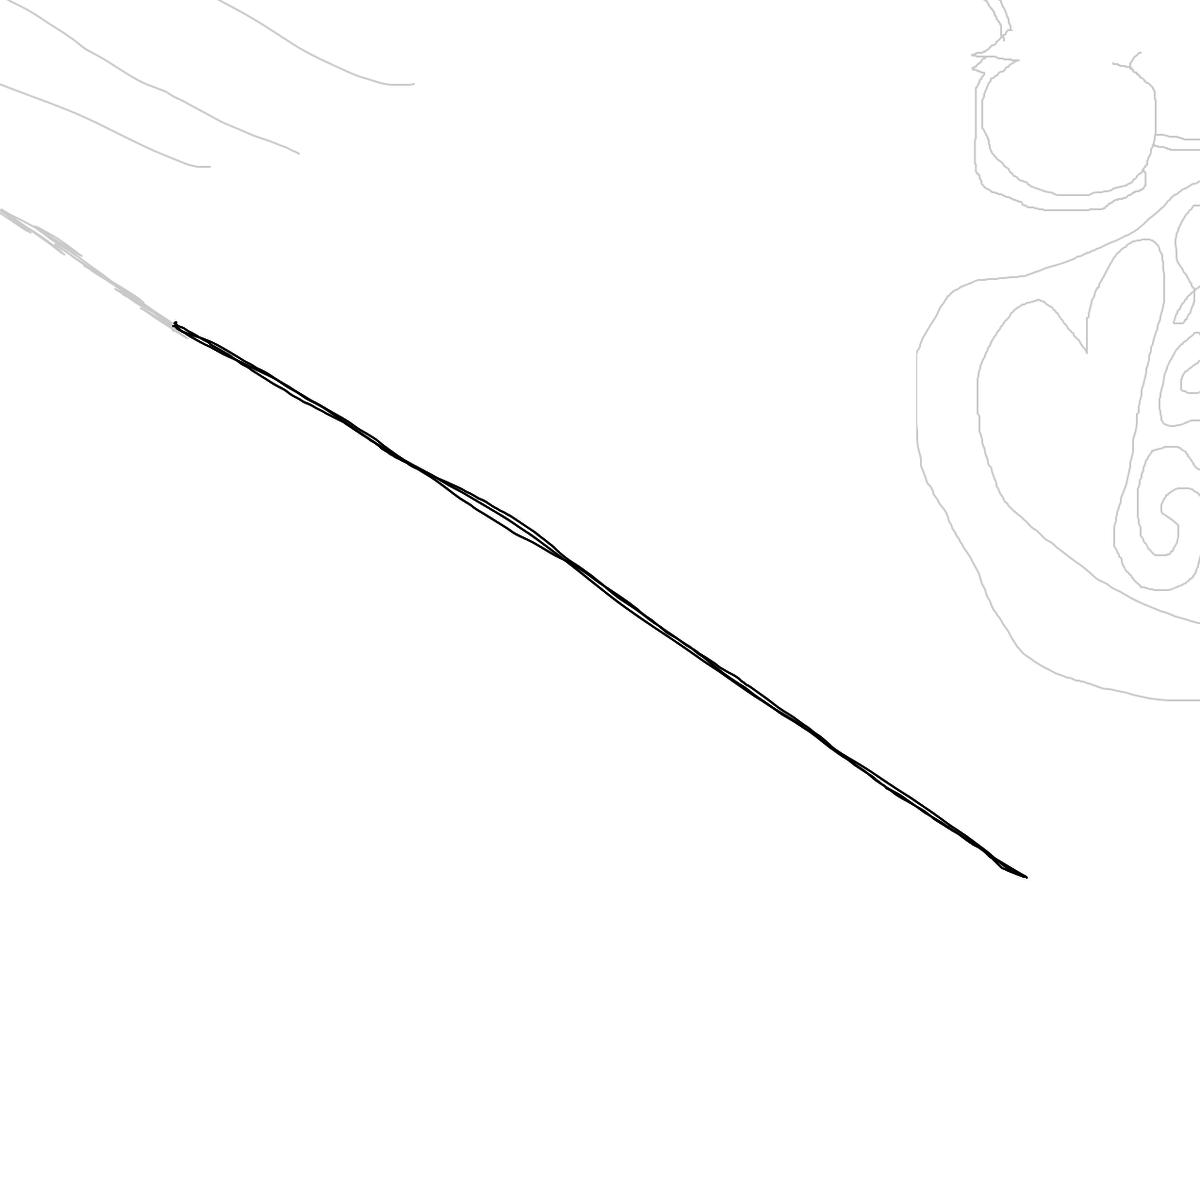 BAAAM drawing#16722 lat:40.7131042480468750lng: -74.0123214721679700